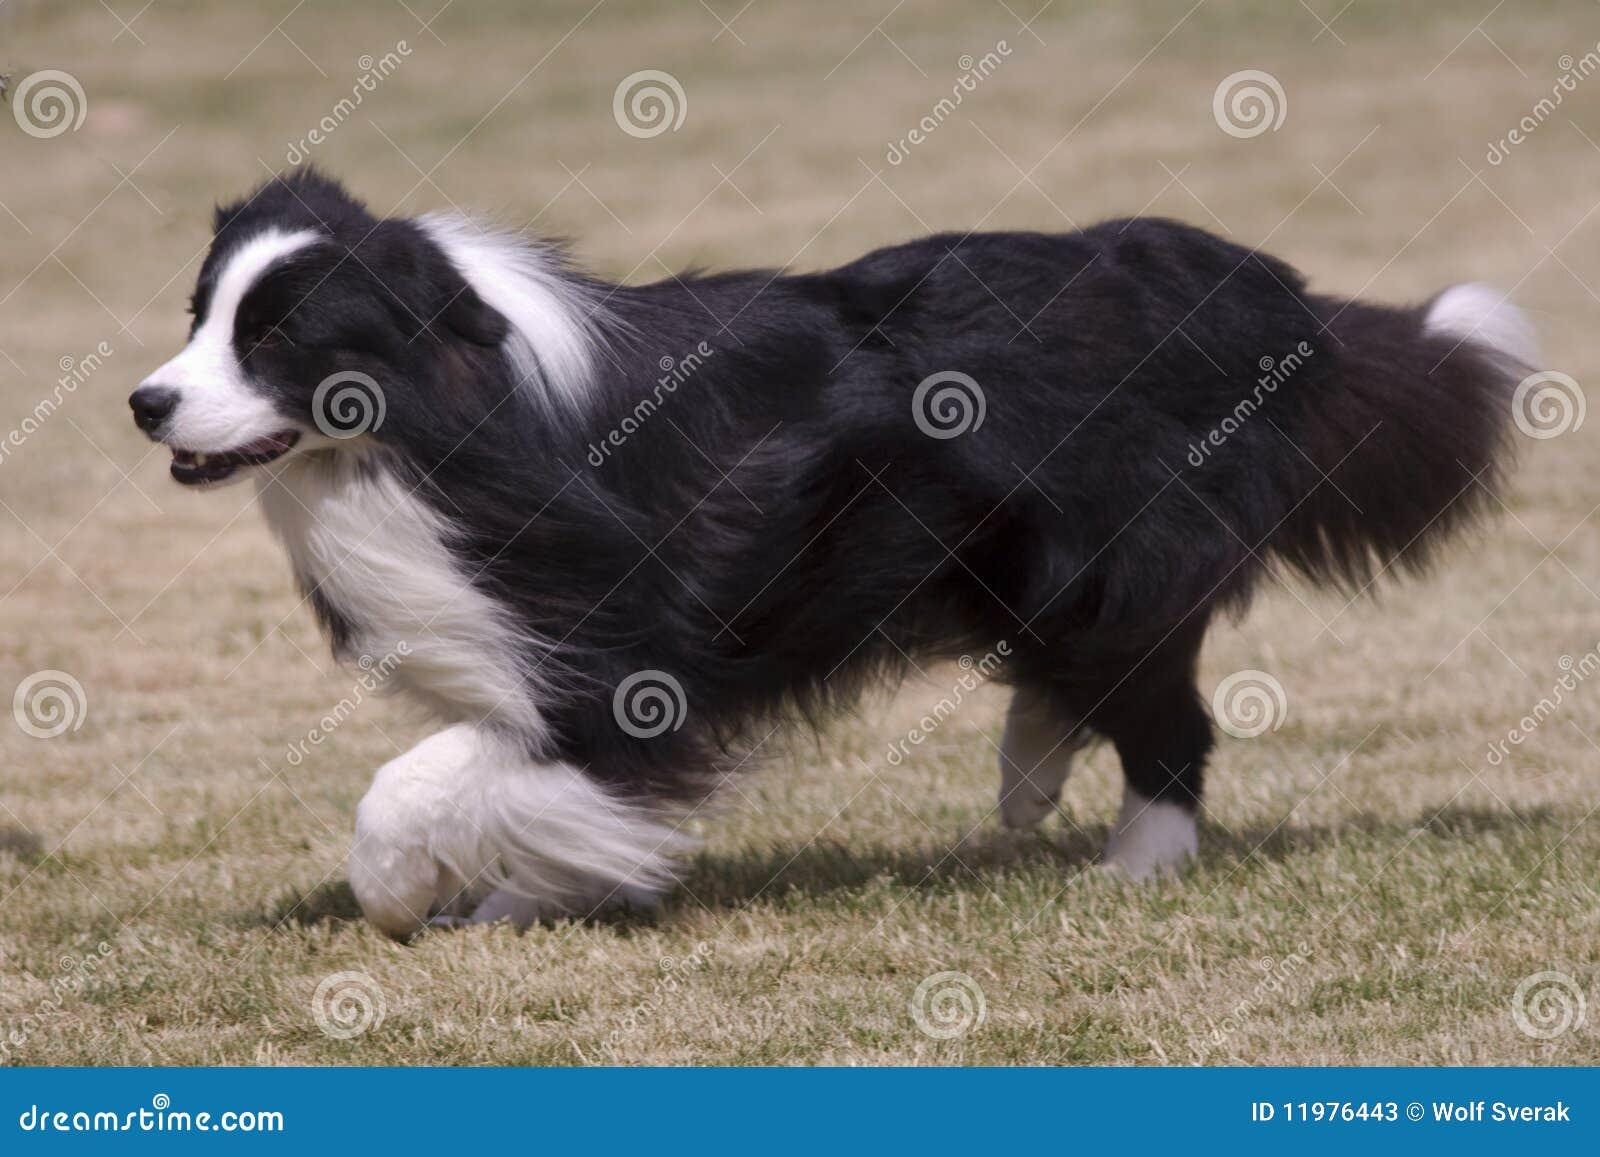 Black Furry Dog Breeds